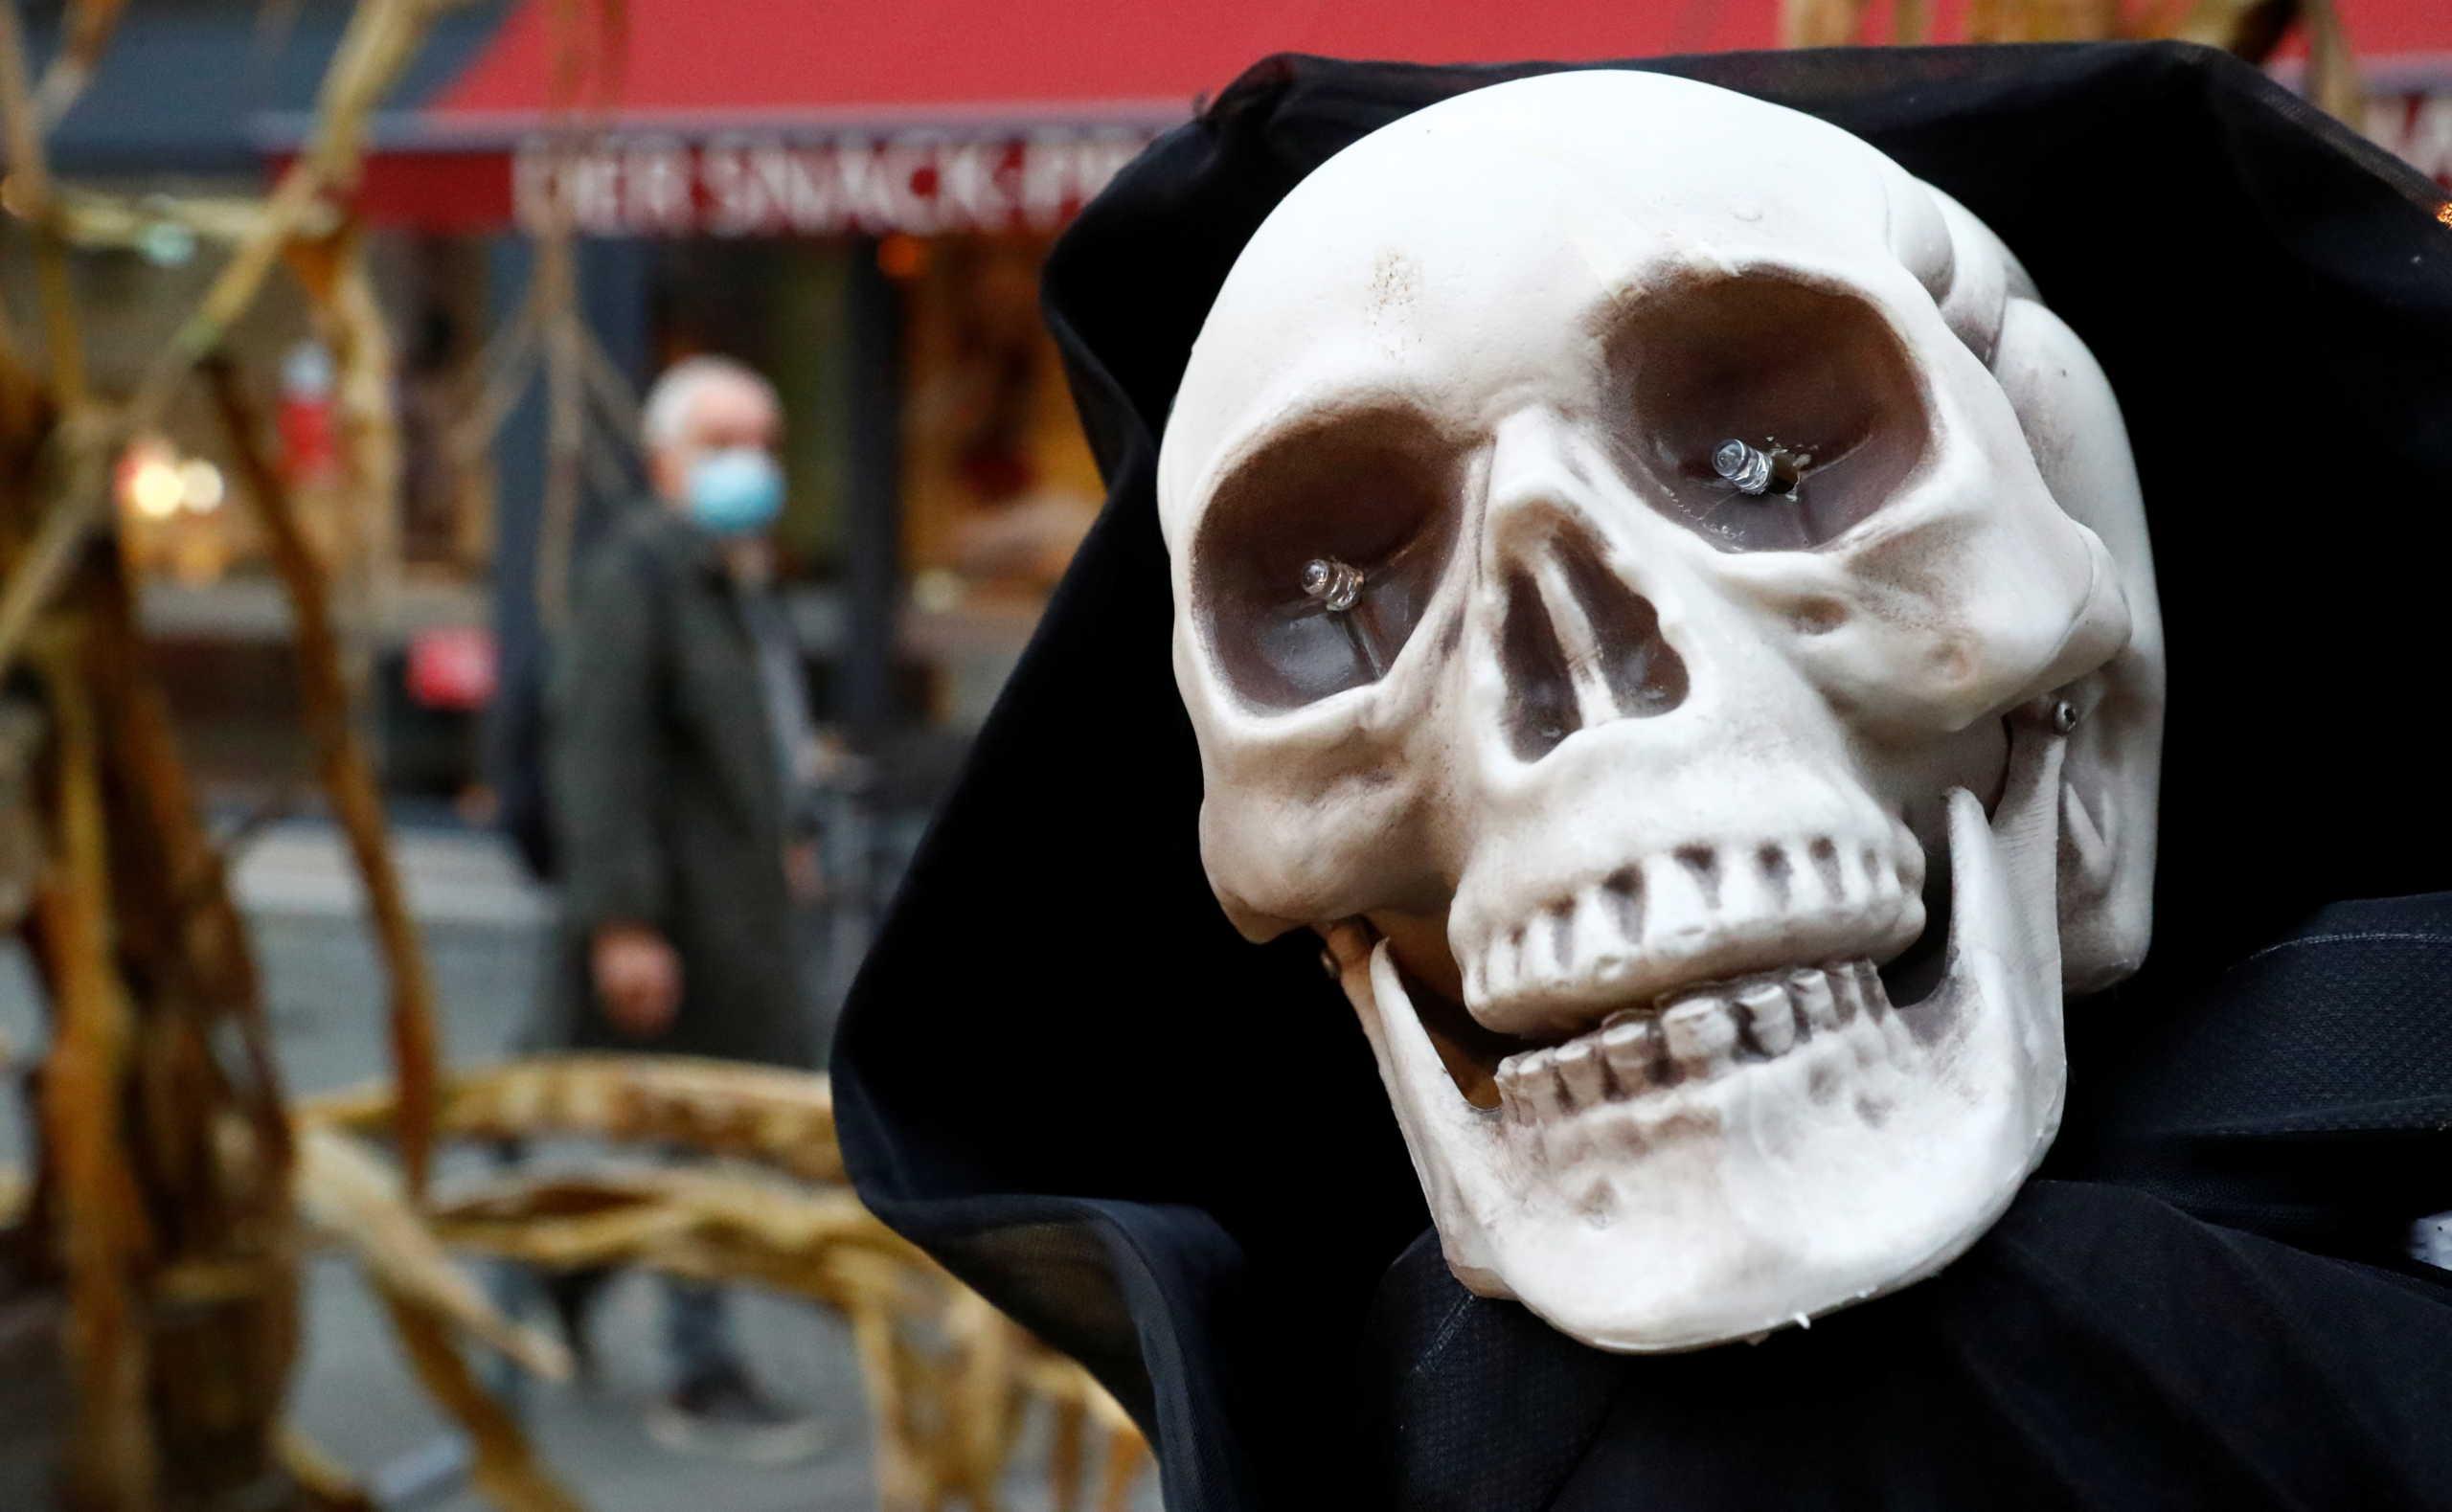 Halloween – Αγγλία: Απαγορεύτηκε στις περιοχές που βρίσκονται στο υψηλότερο επίπεδο lockdown